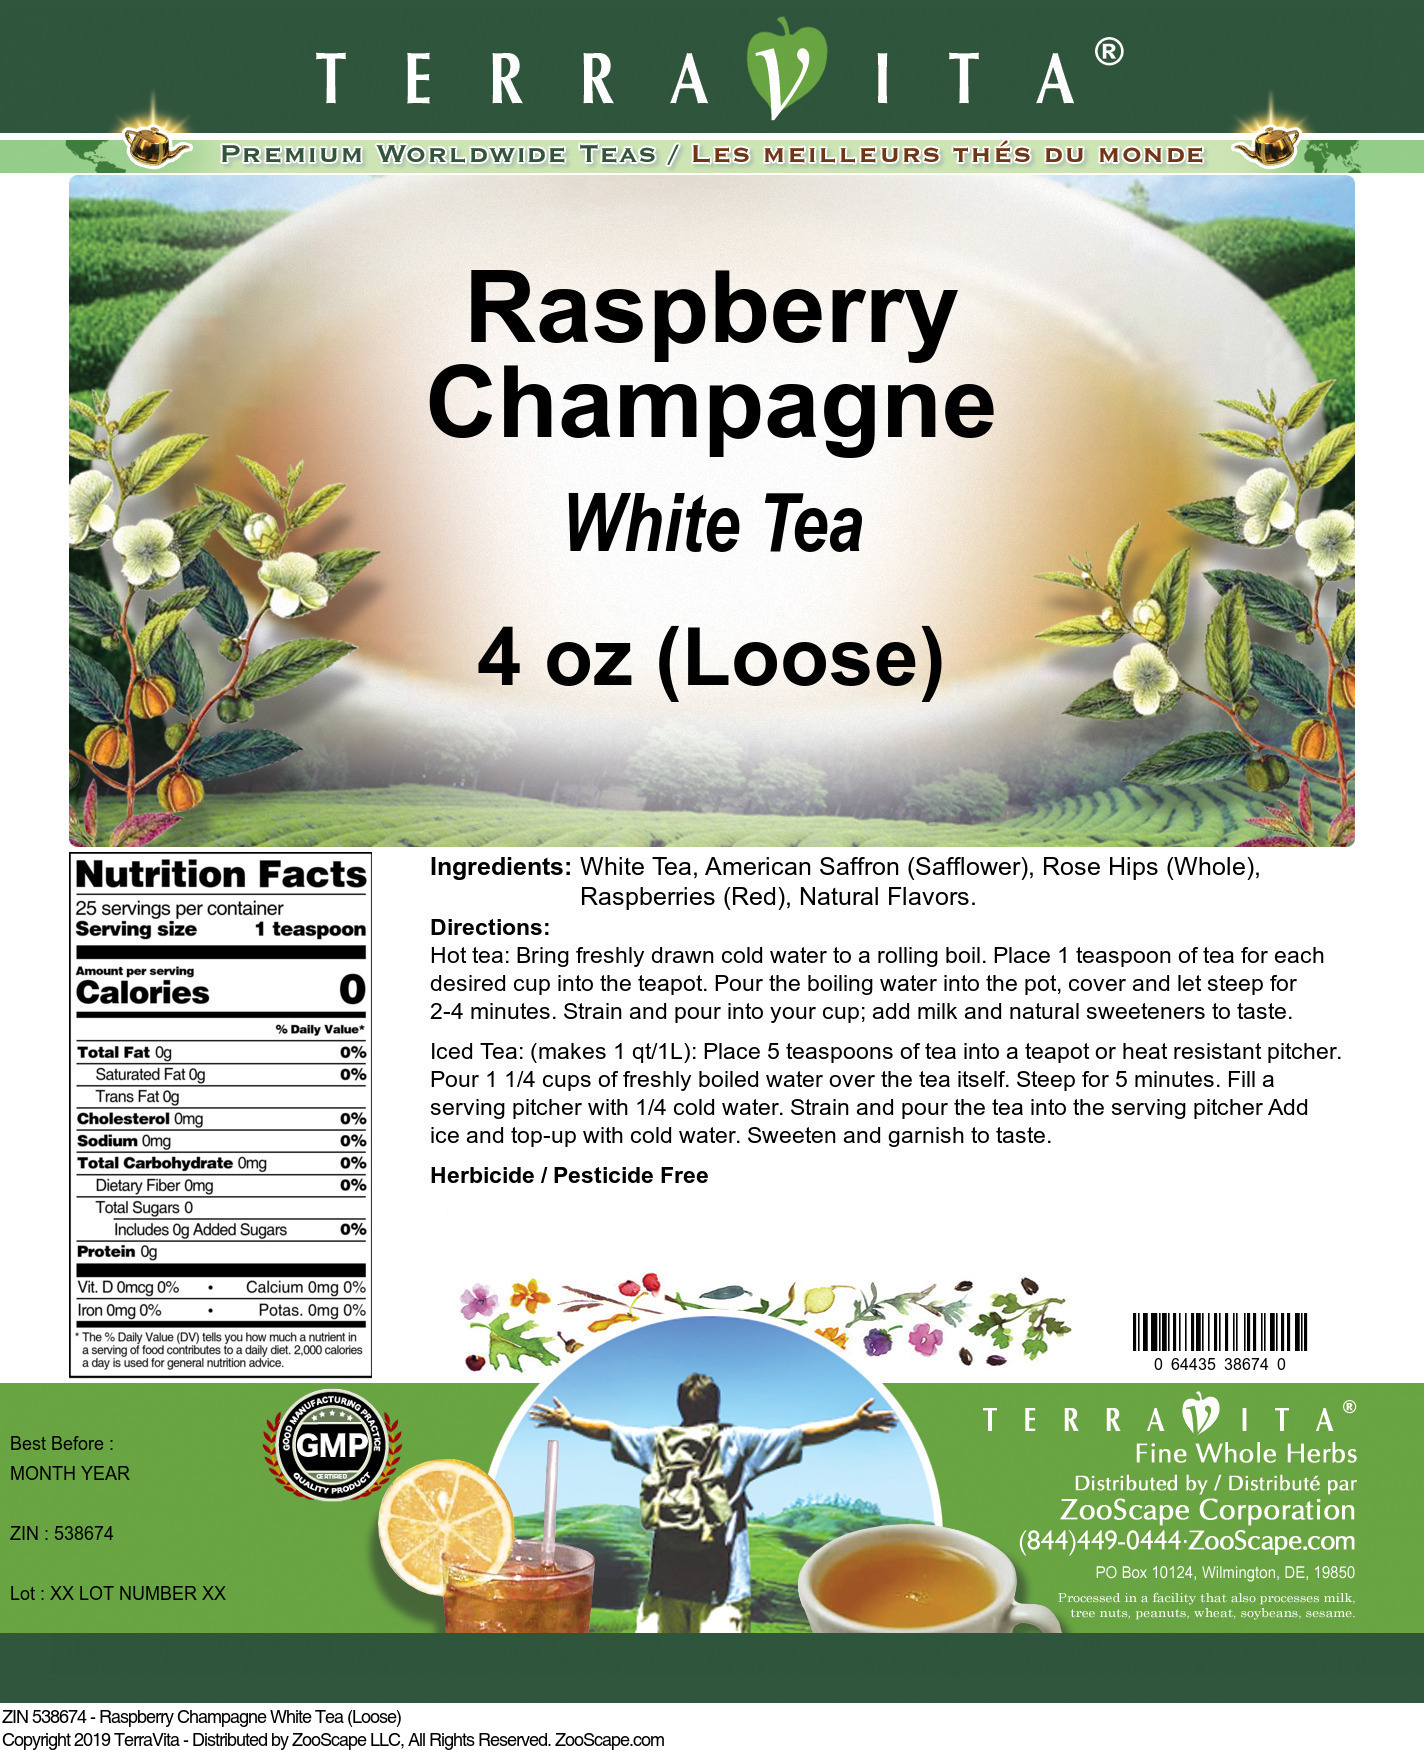 Raspberry Champagne White Tea